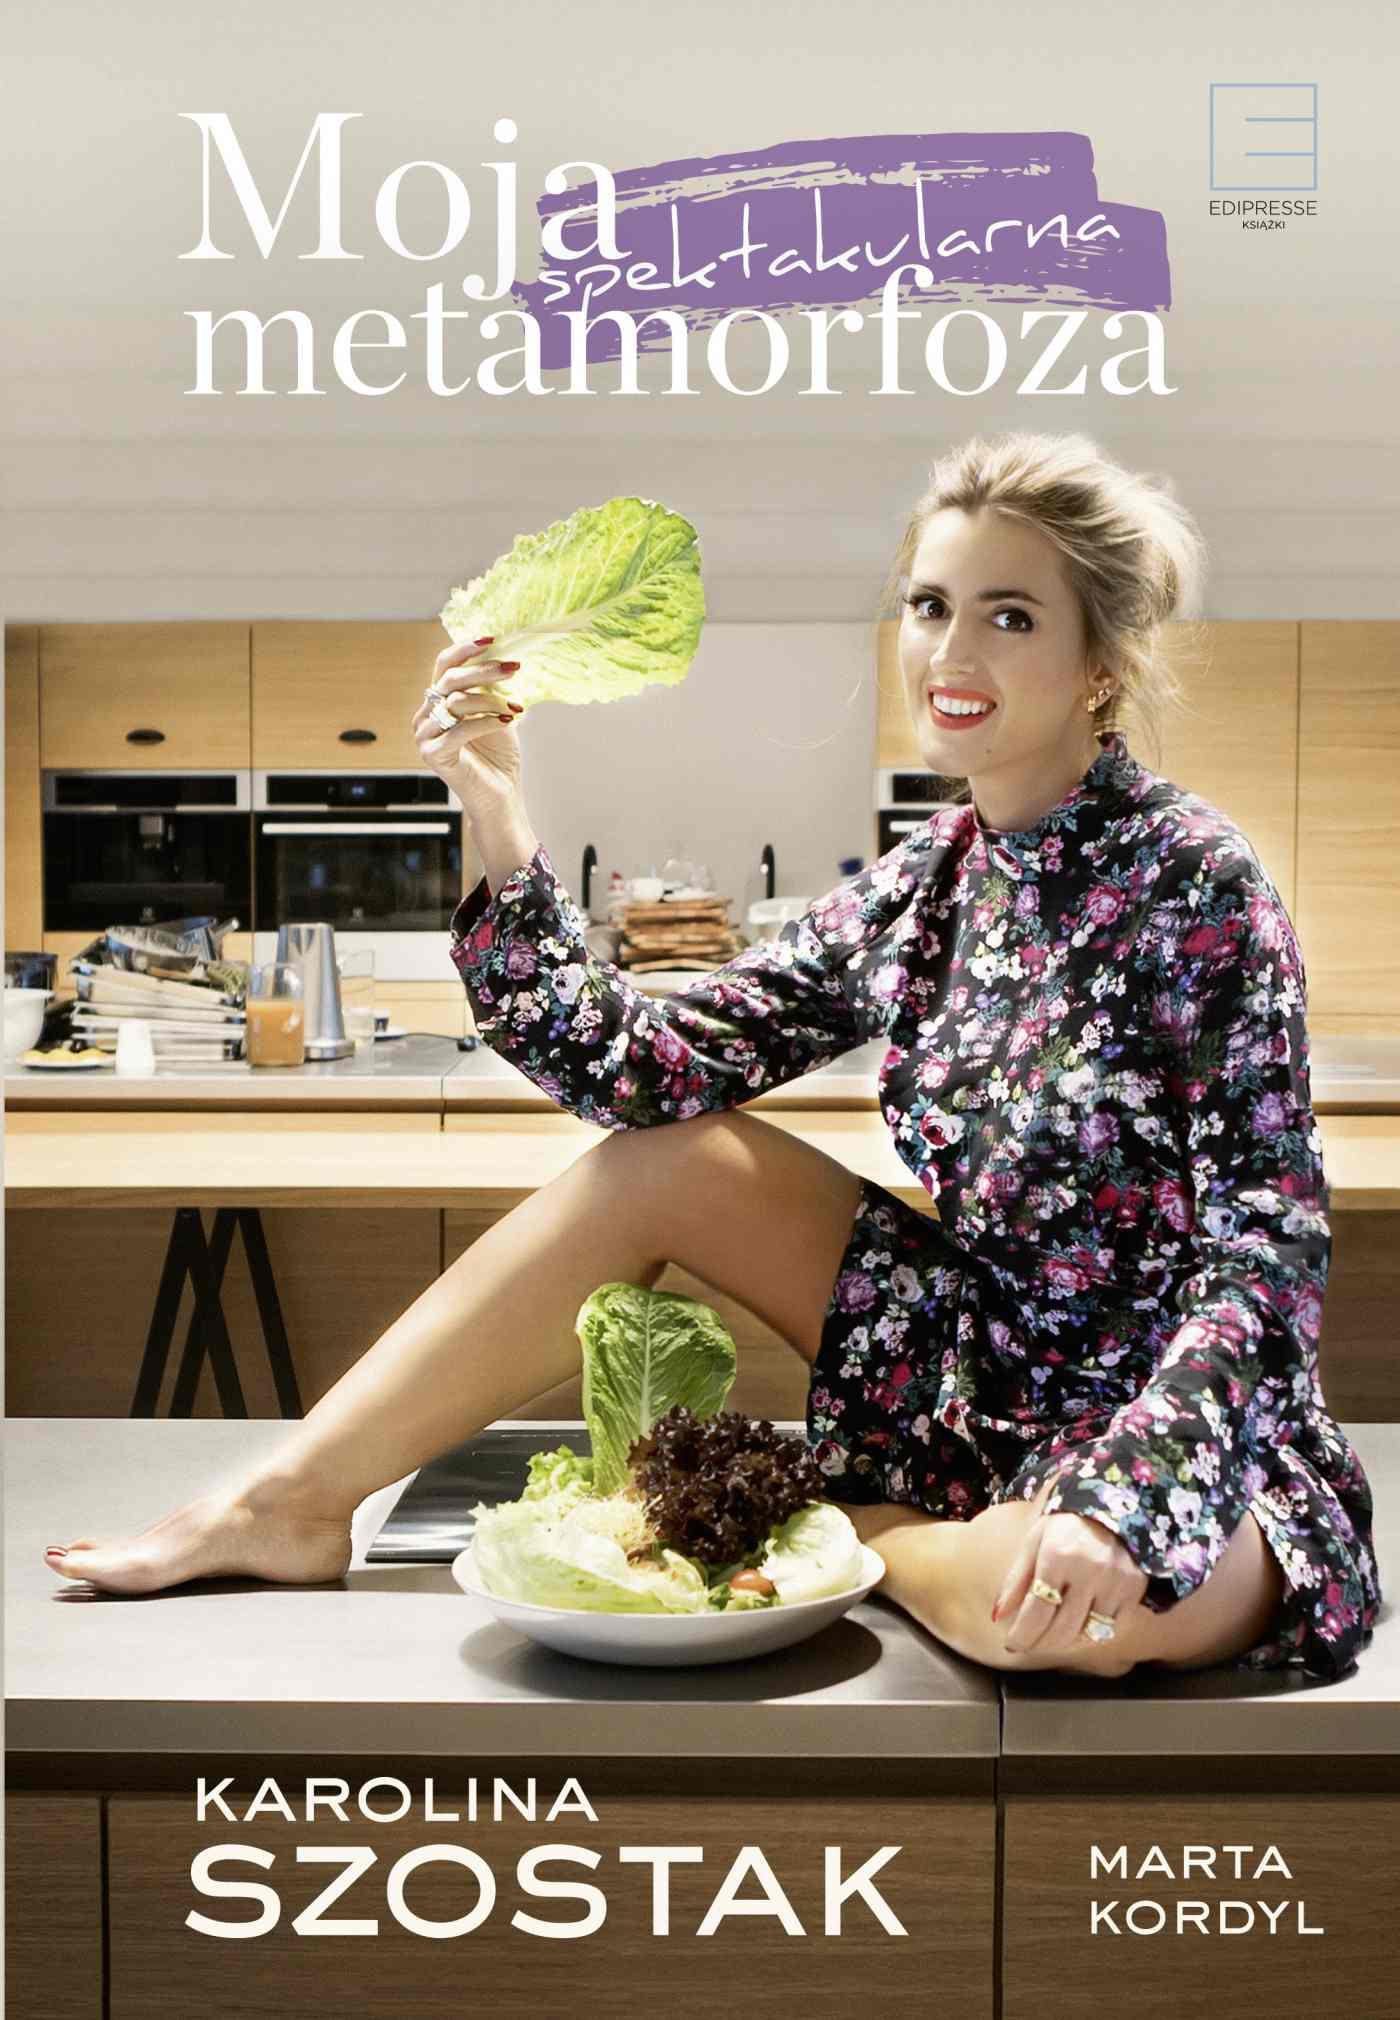 Moja spektakularna metamorfoza - Ebook (Książka na Kindle) do pobrania w formacie MOBI